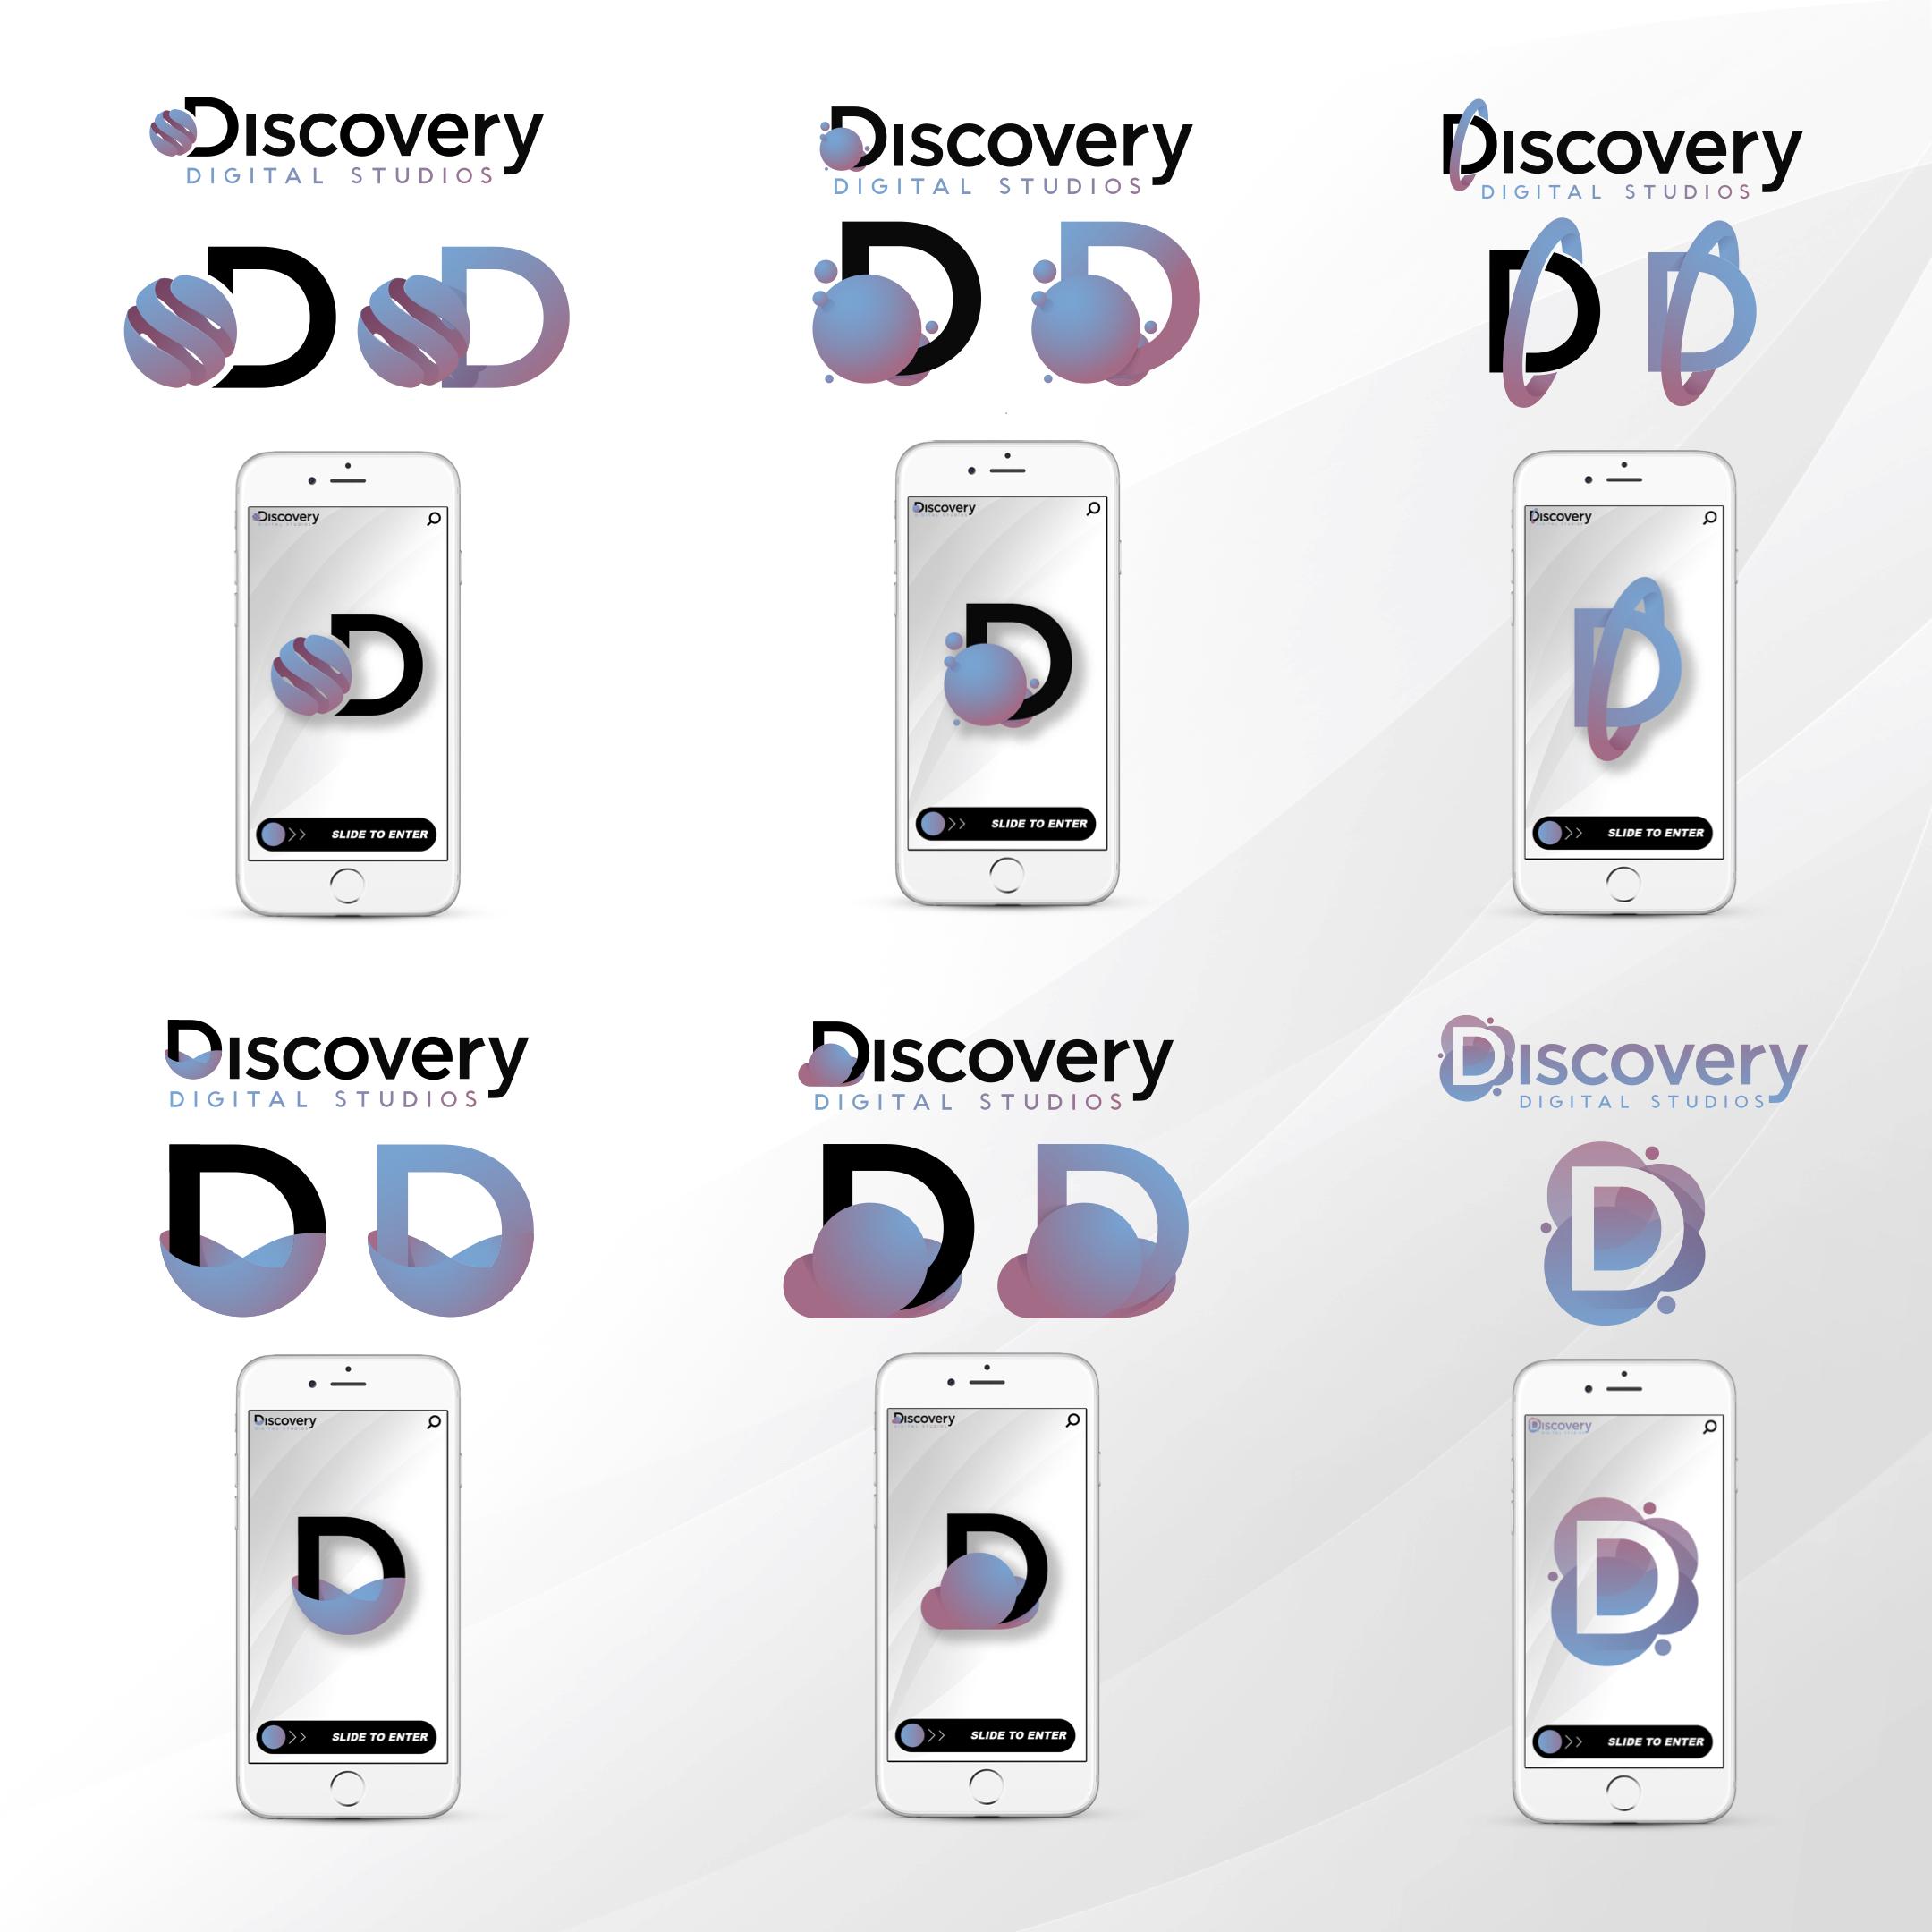 discovery_logos_2.jpg